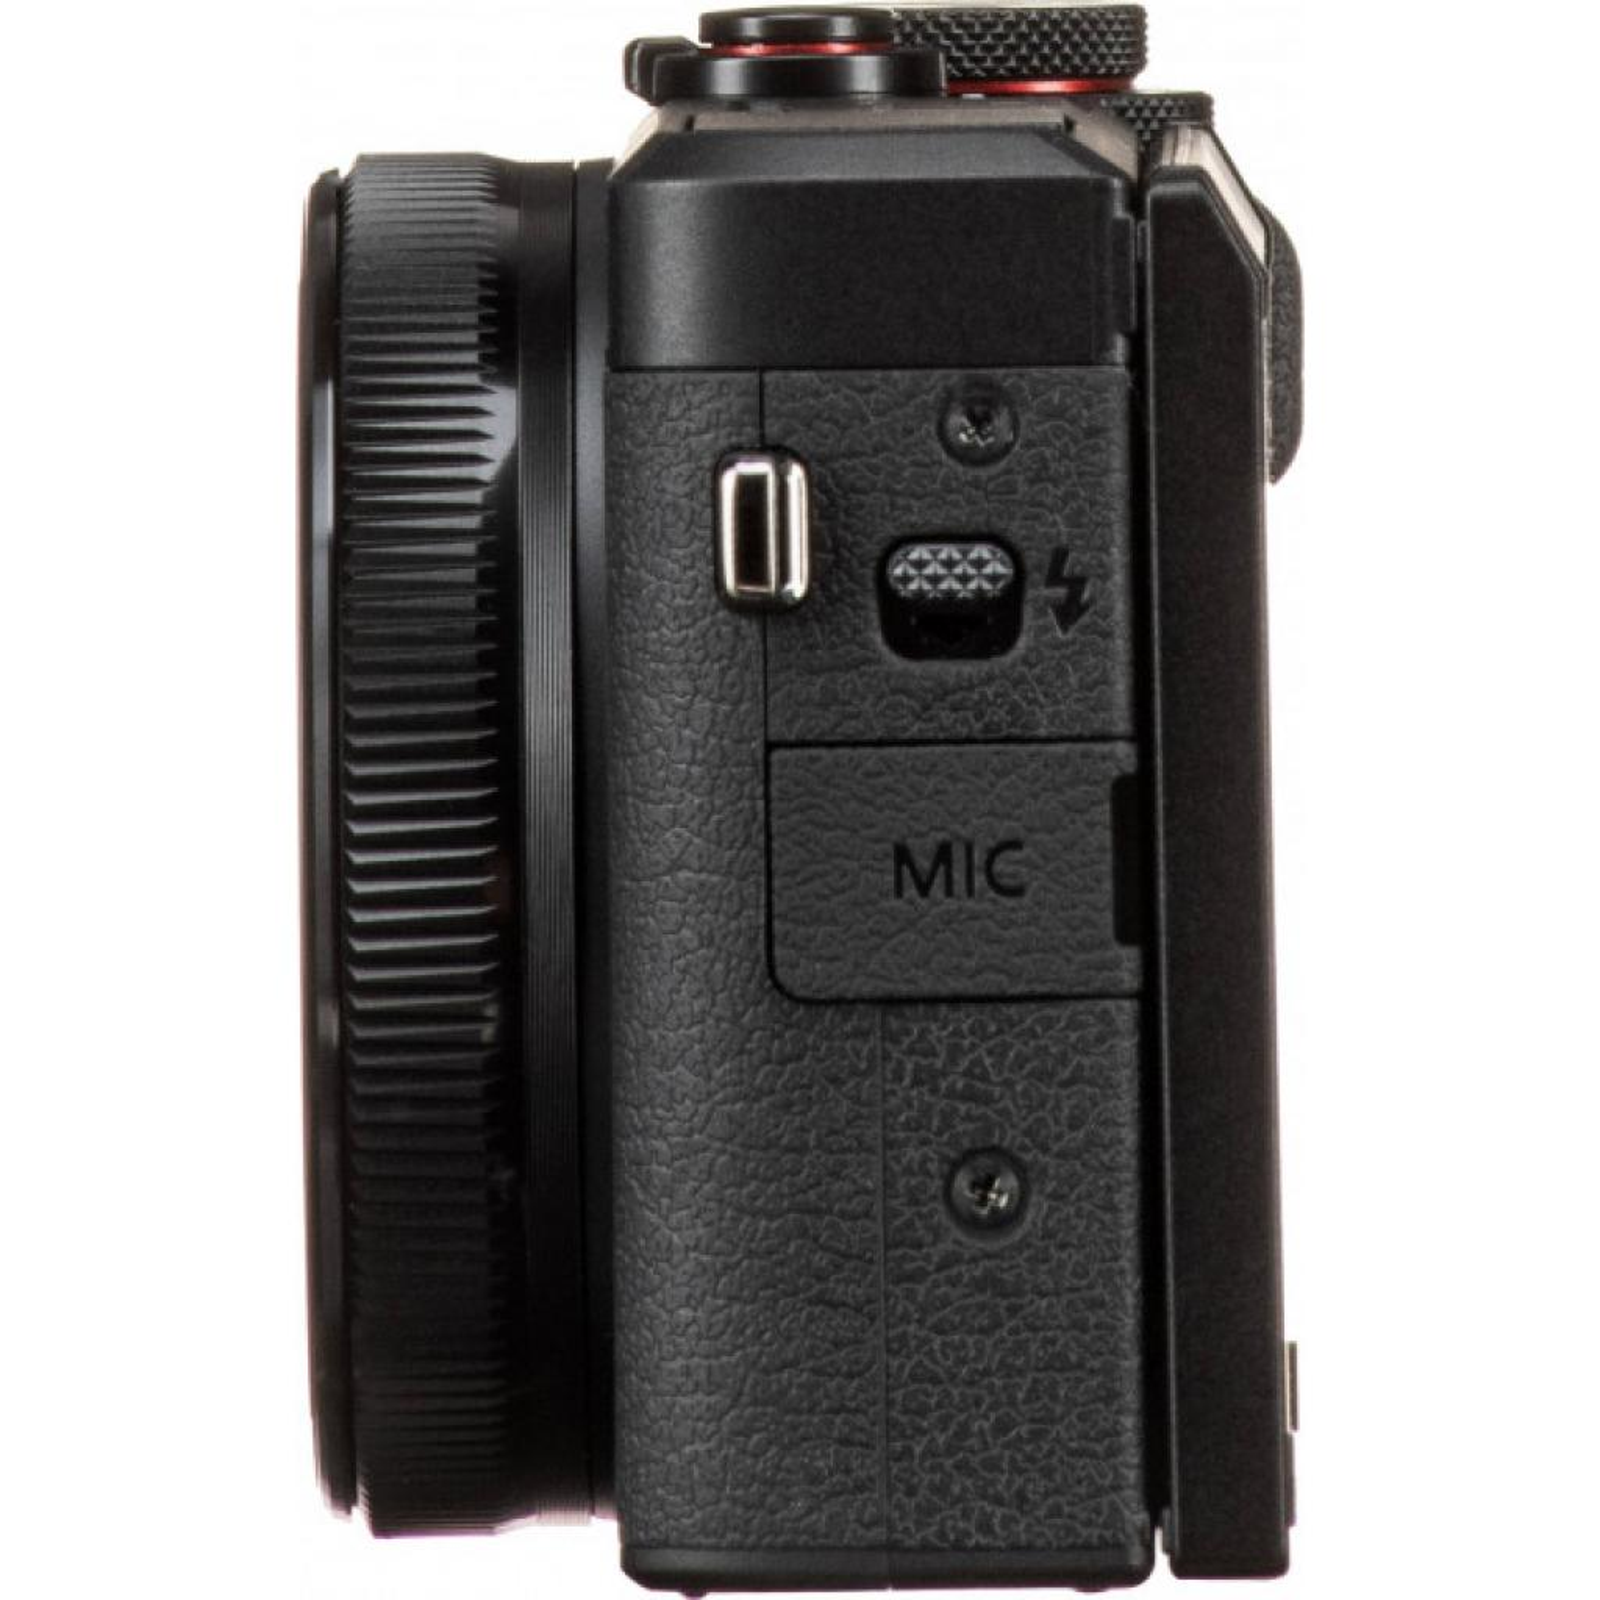 Цифровой фотоаппарат Canon Powershot G7 X Mark III Black (3637C013) изображение 10